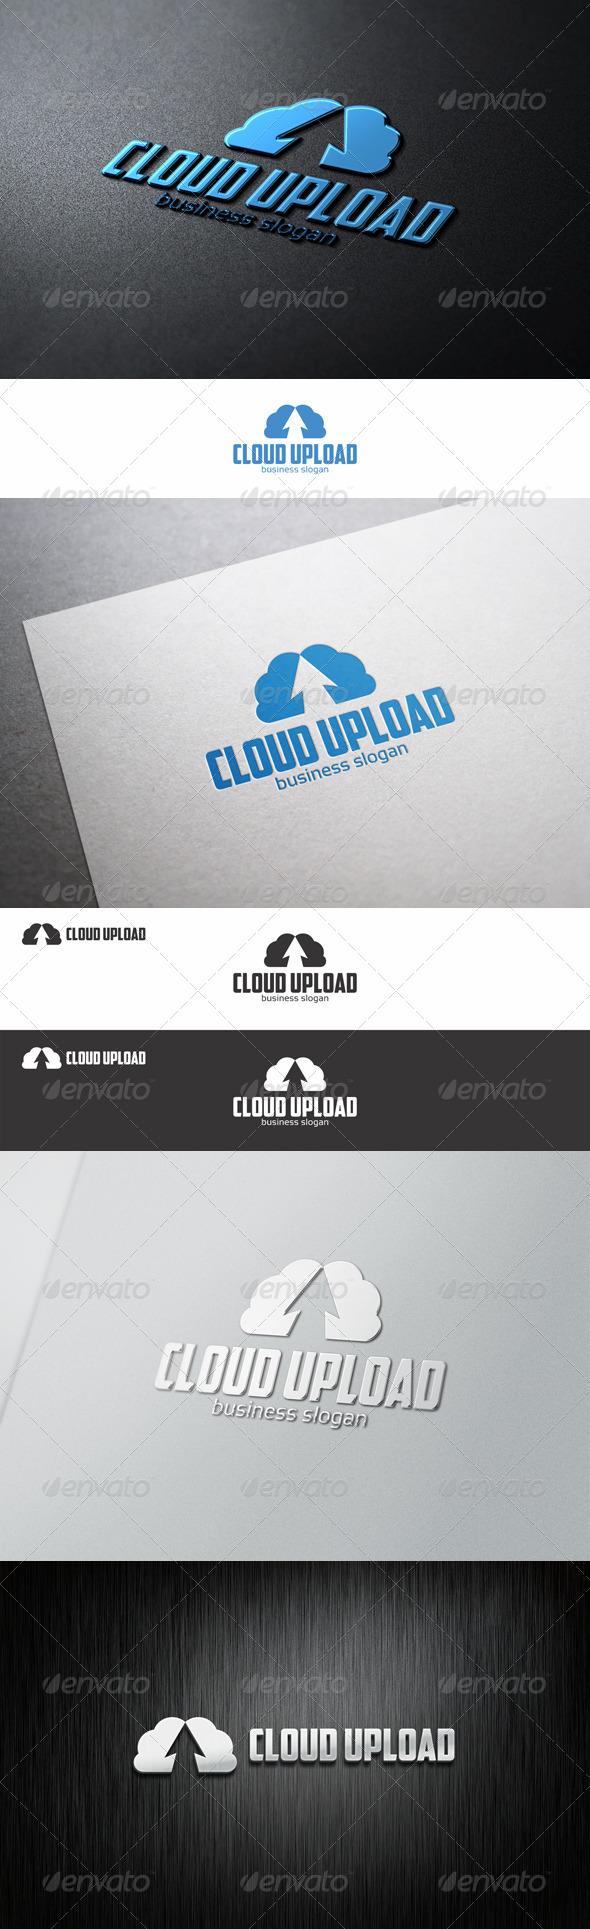 Cloud Up - Upload Hosting Logo - Nature Logo Templates